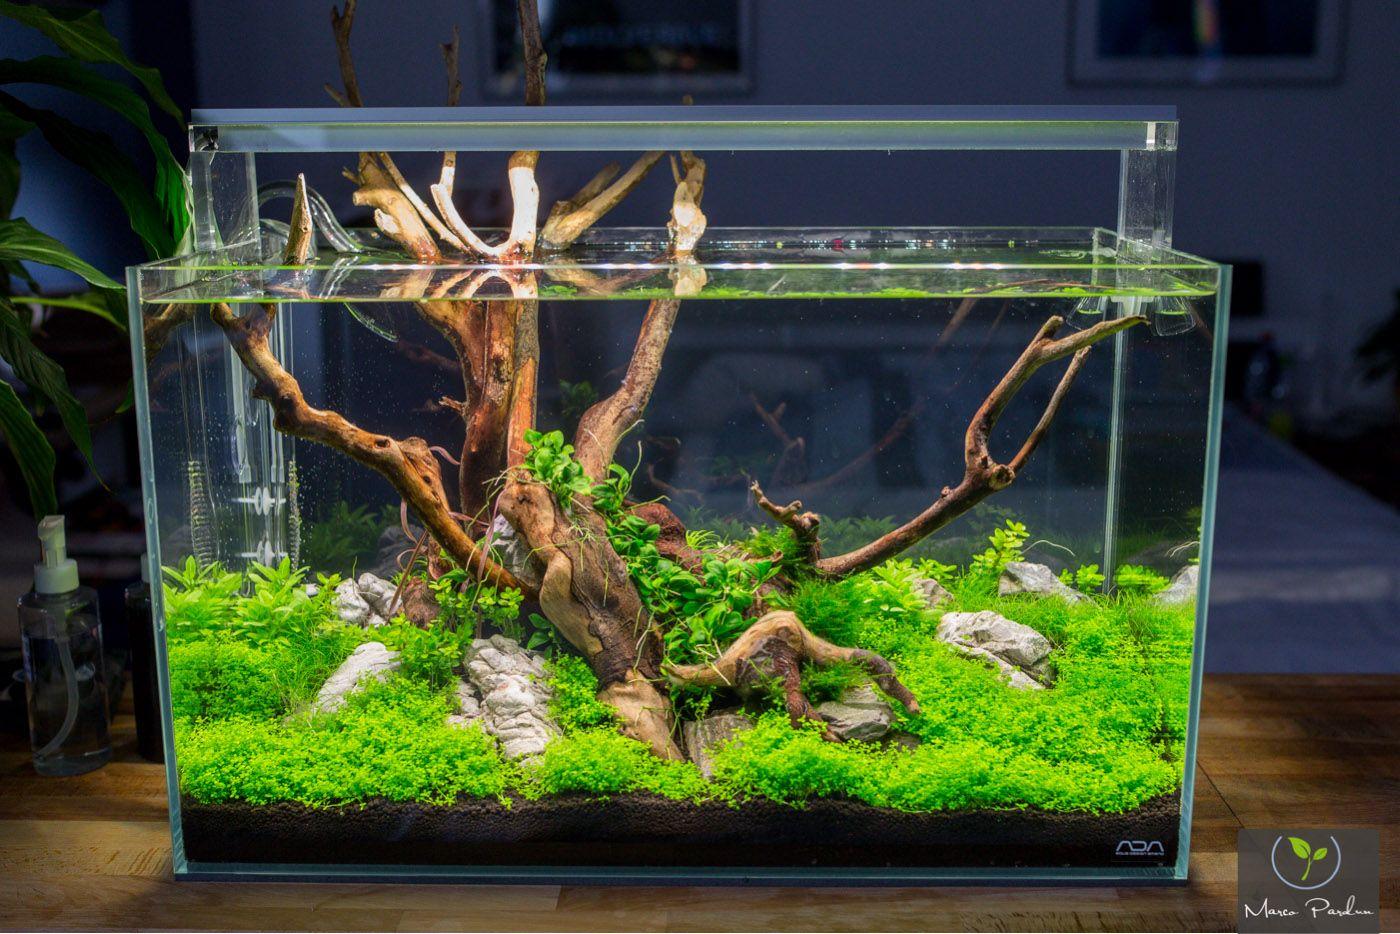 Led badezimmerlampe ~ Diy led lampe selber bauen akvárium aquariums